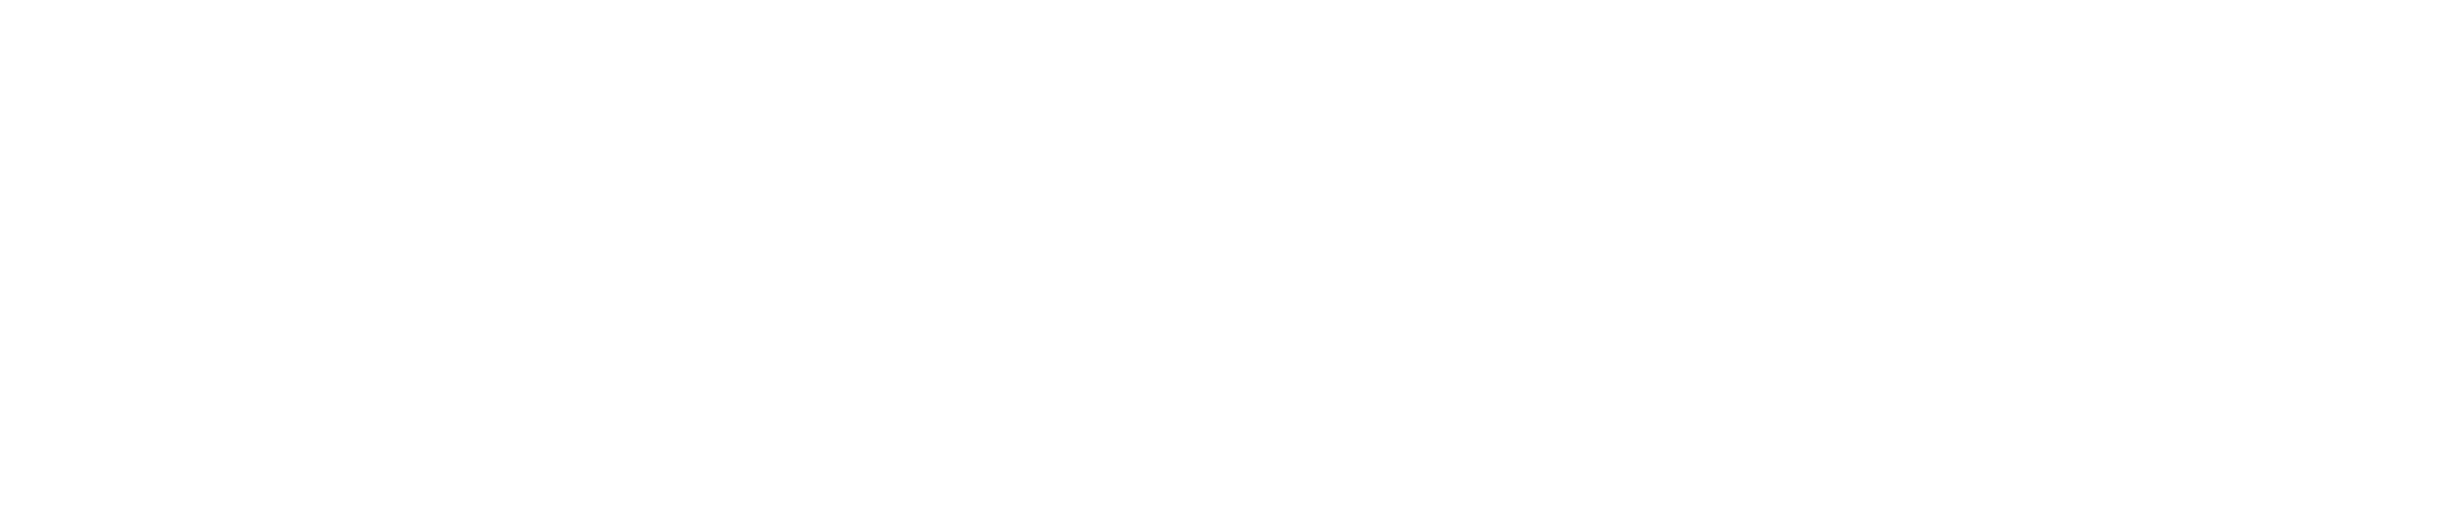 client logo wall